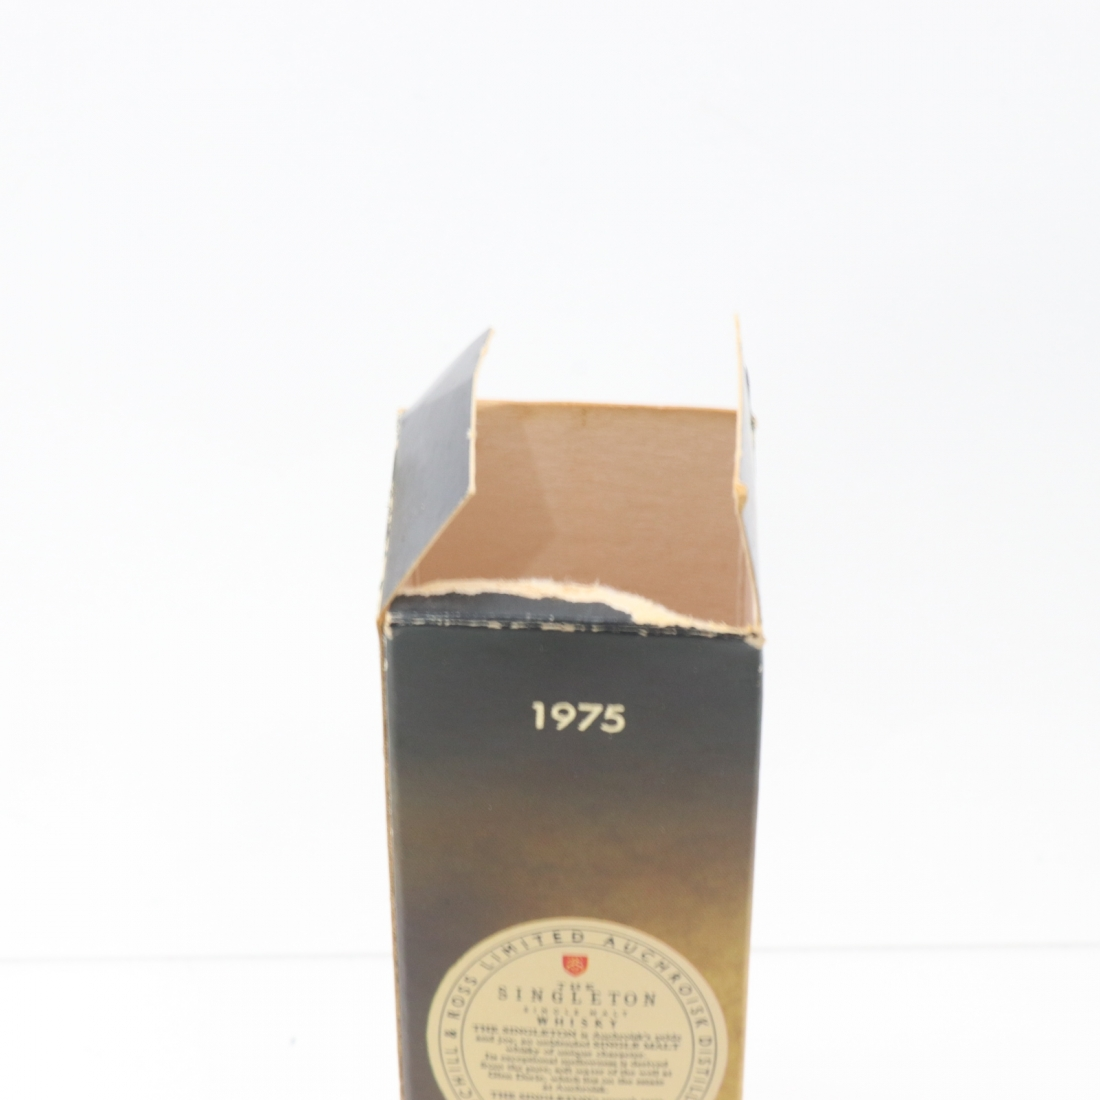 Speyside Miniature Selection x 9 / including Aberlour 1970